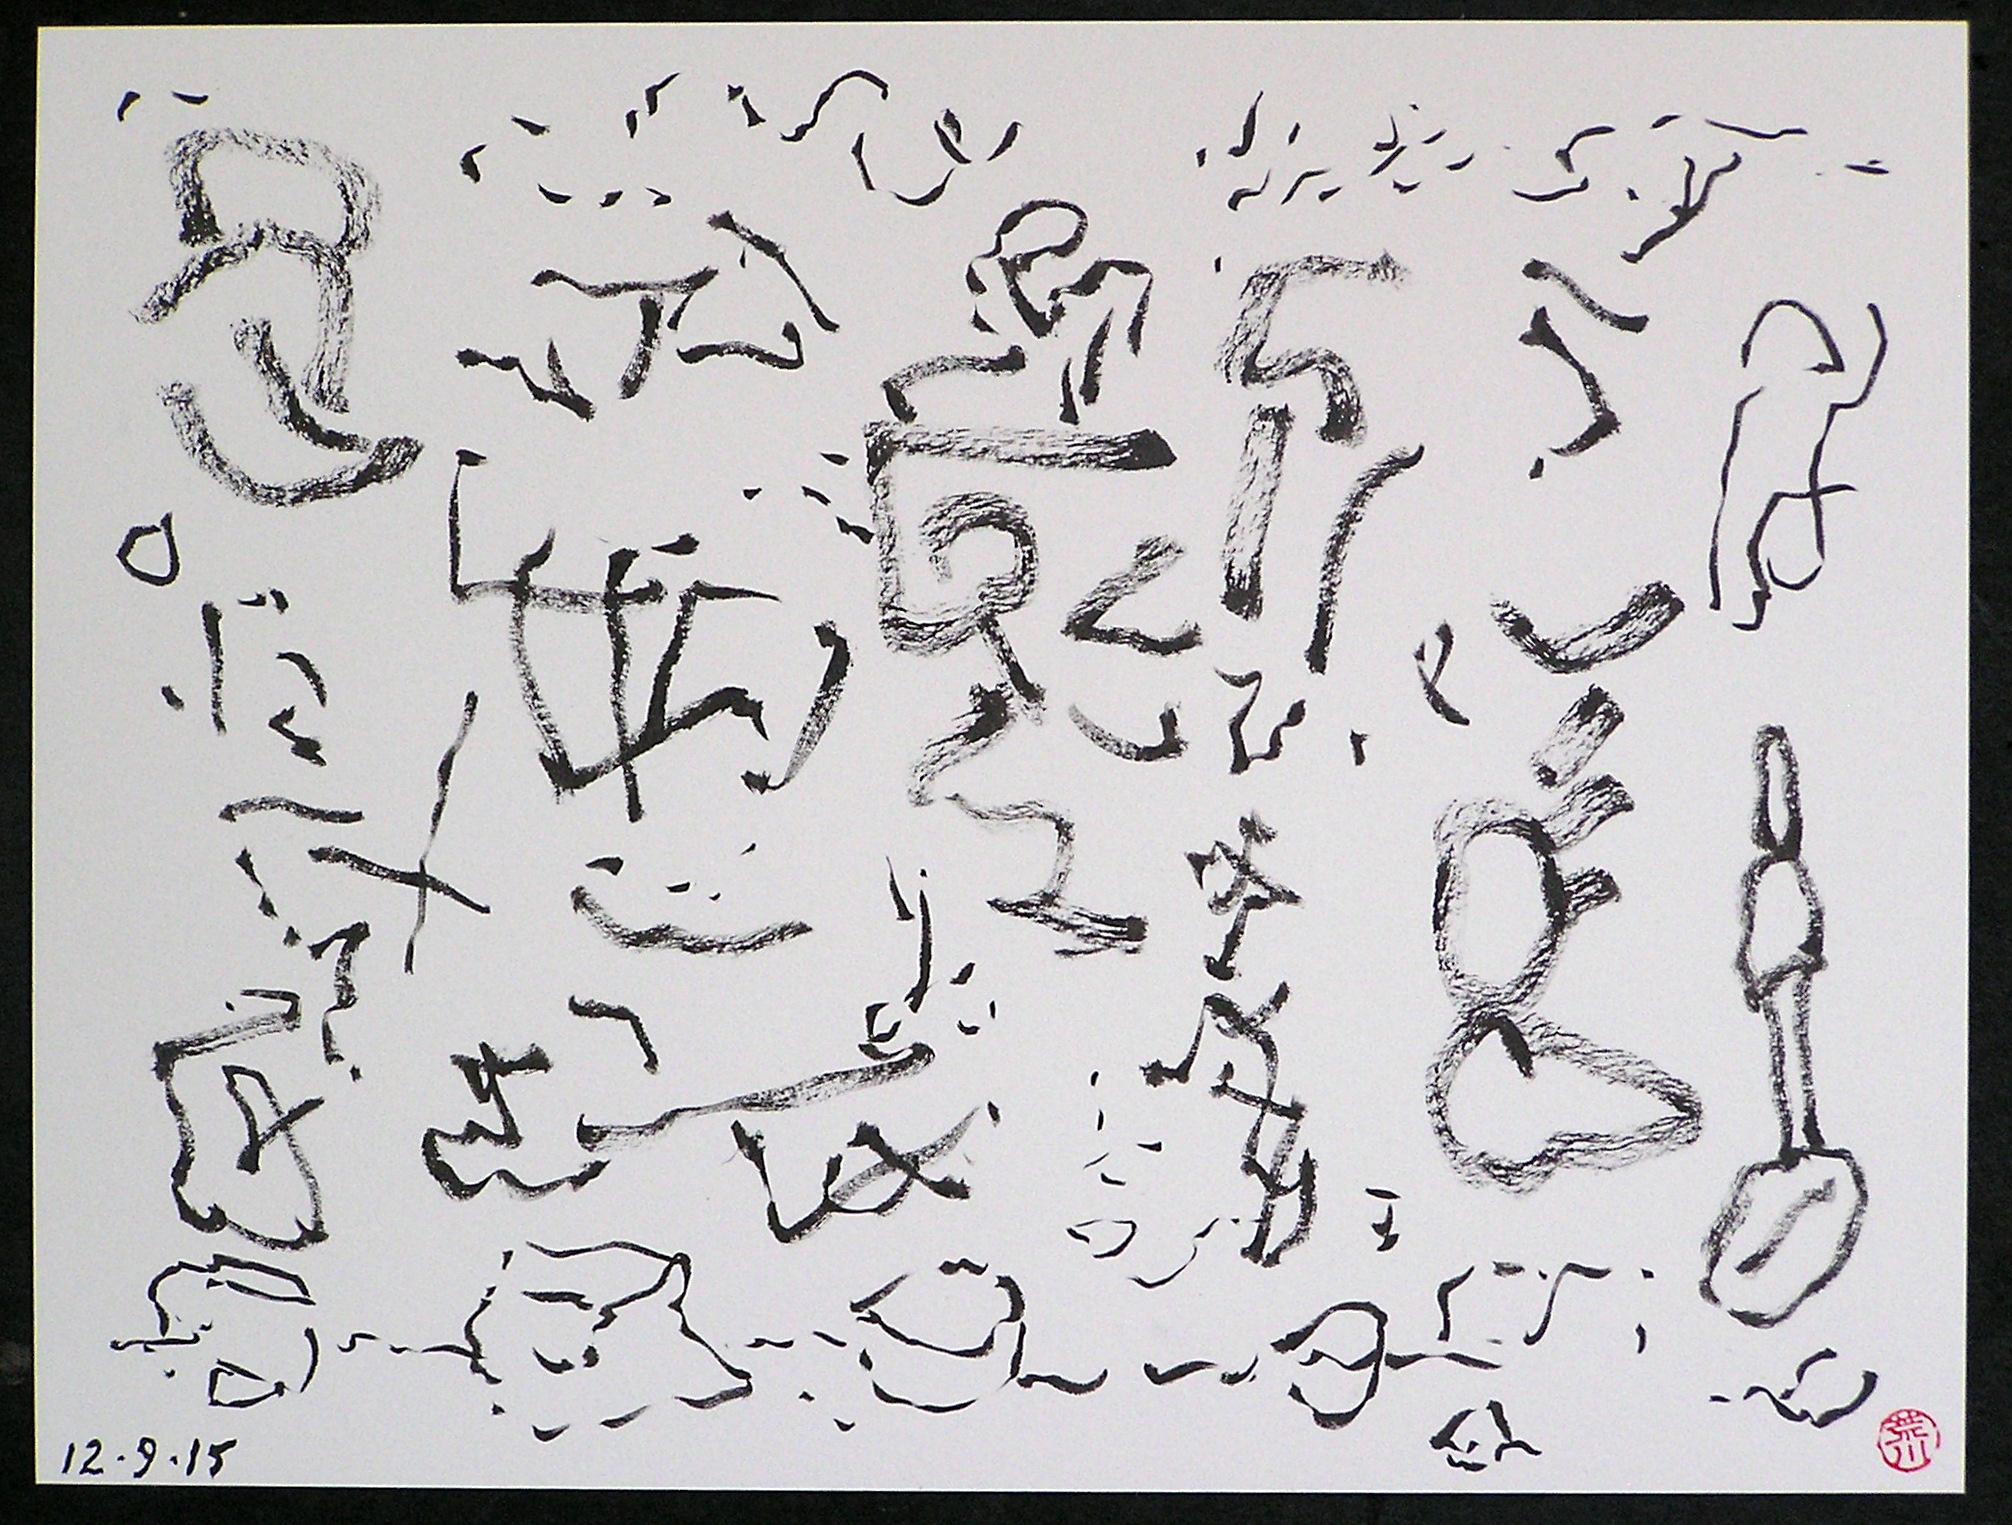 Peter Arakawa's Signature